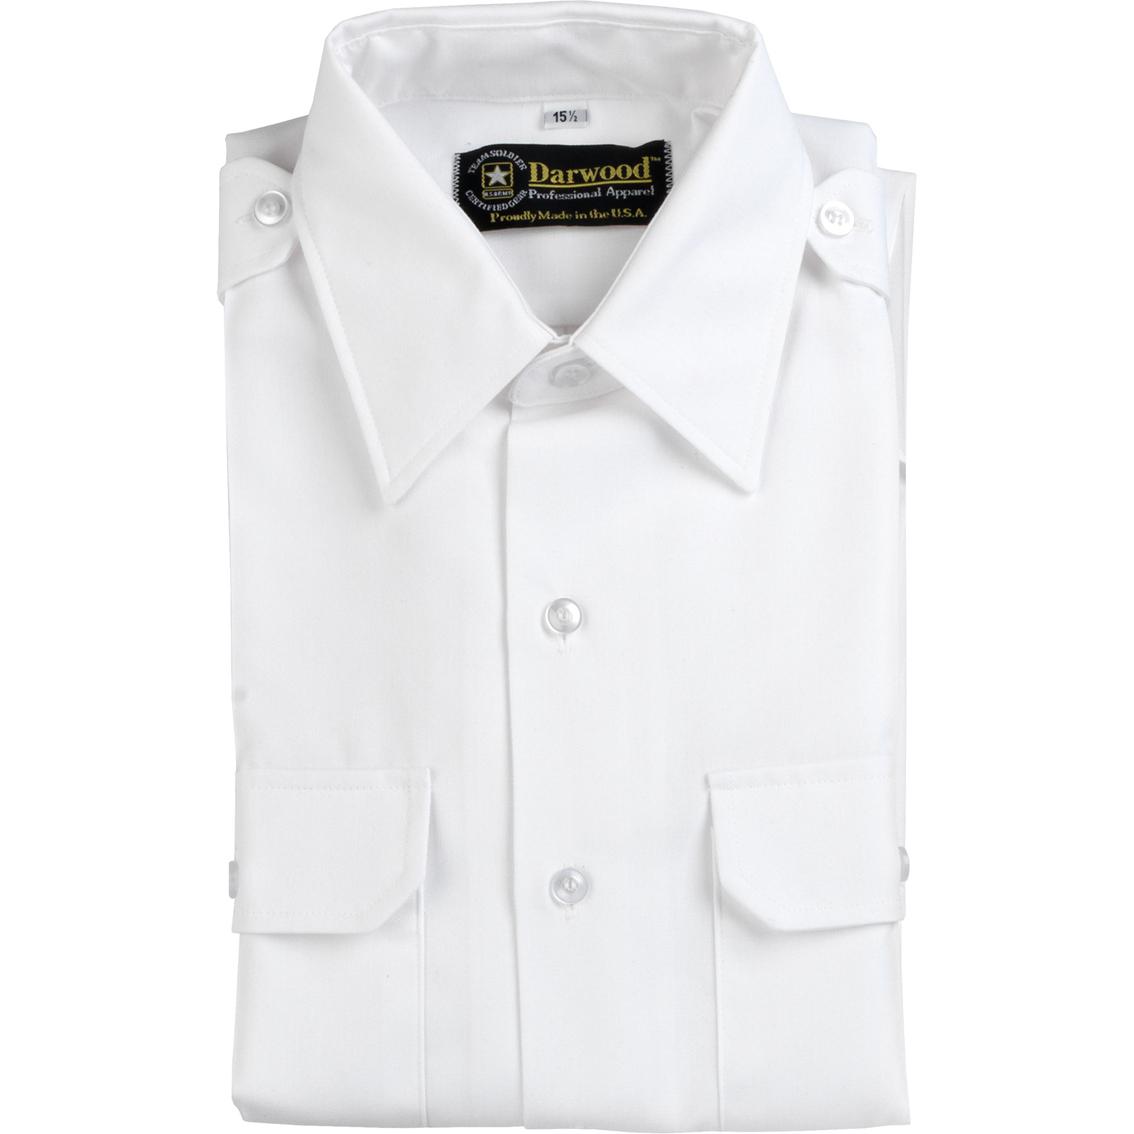 Dlats men 39 s long sleeve asu shirt shirts military for White military dress shirt